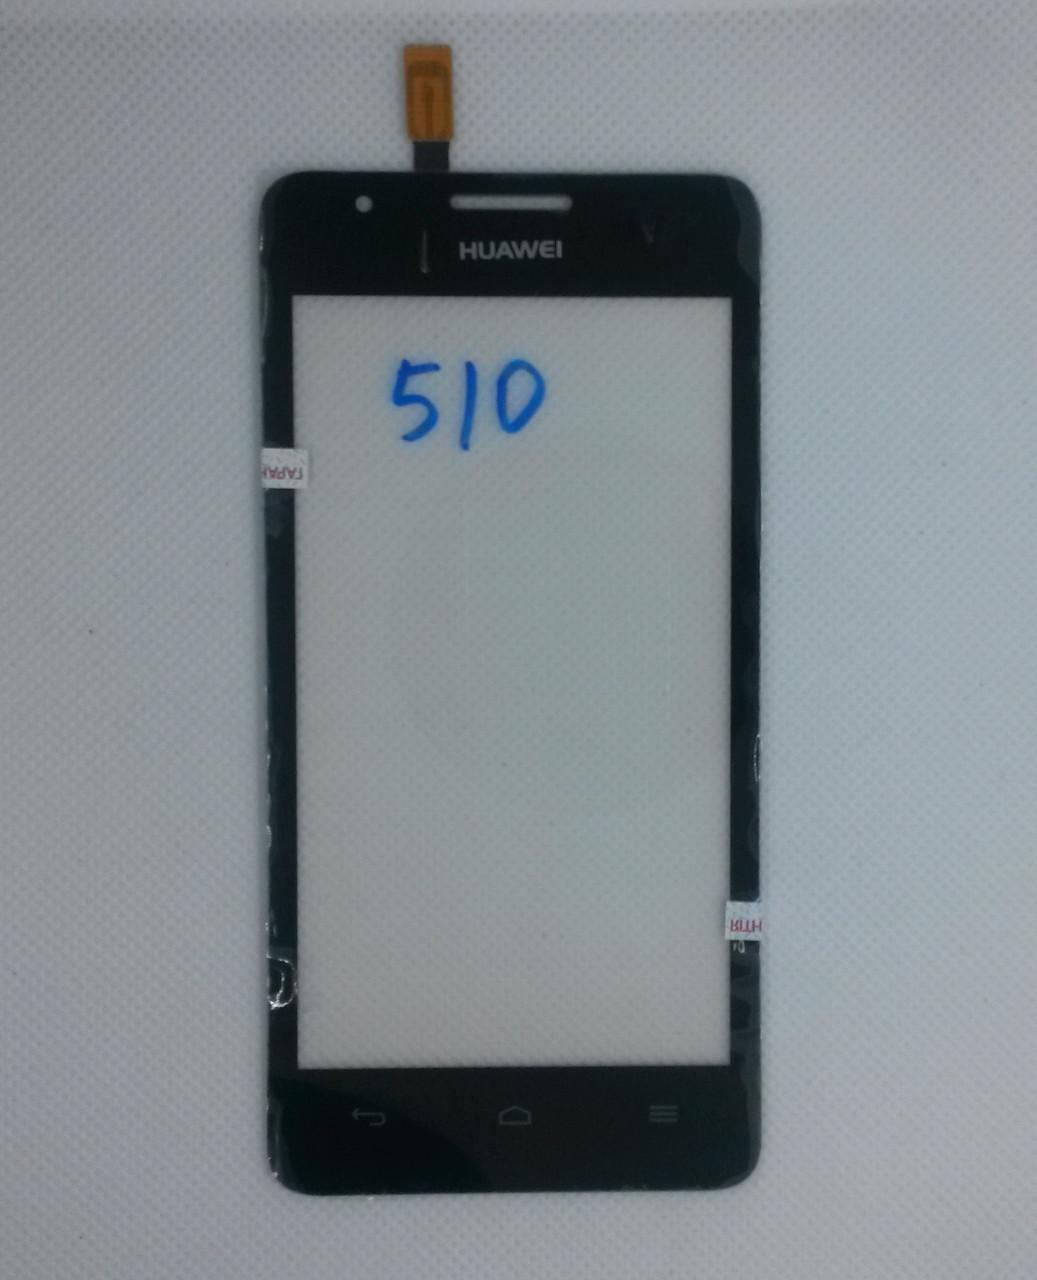 Cенсорный экран Huawei Ascend G510 BLACK (тачскрин, сенсор)